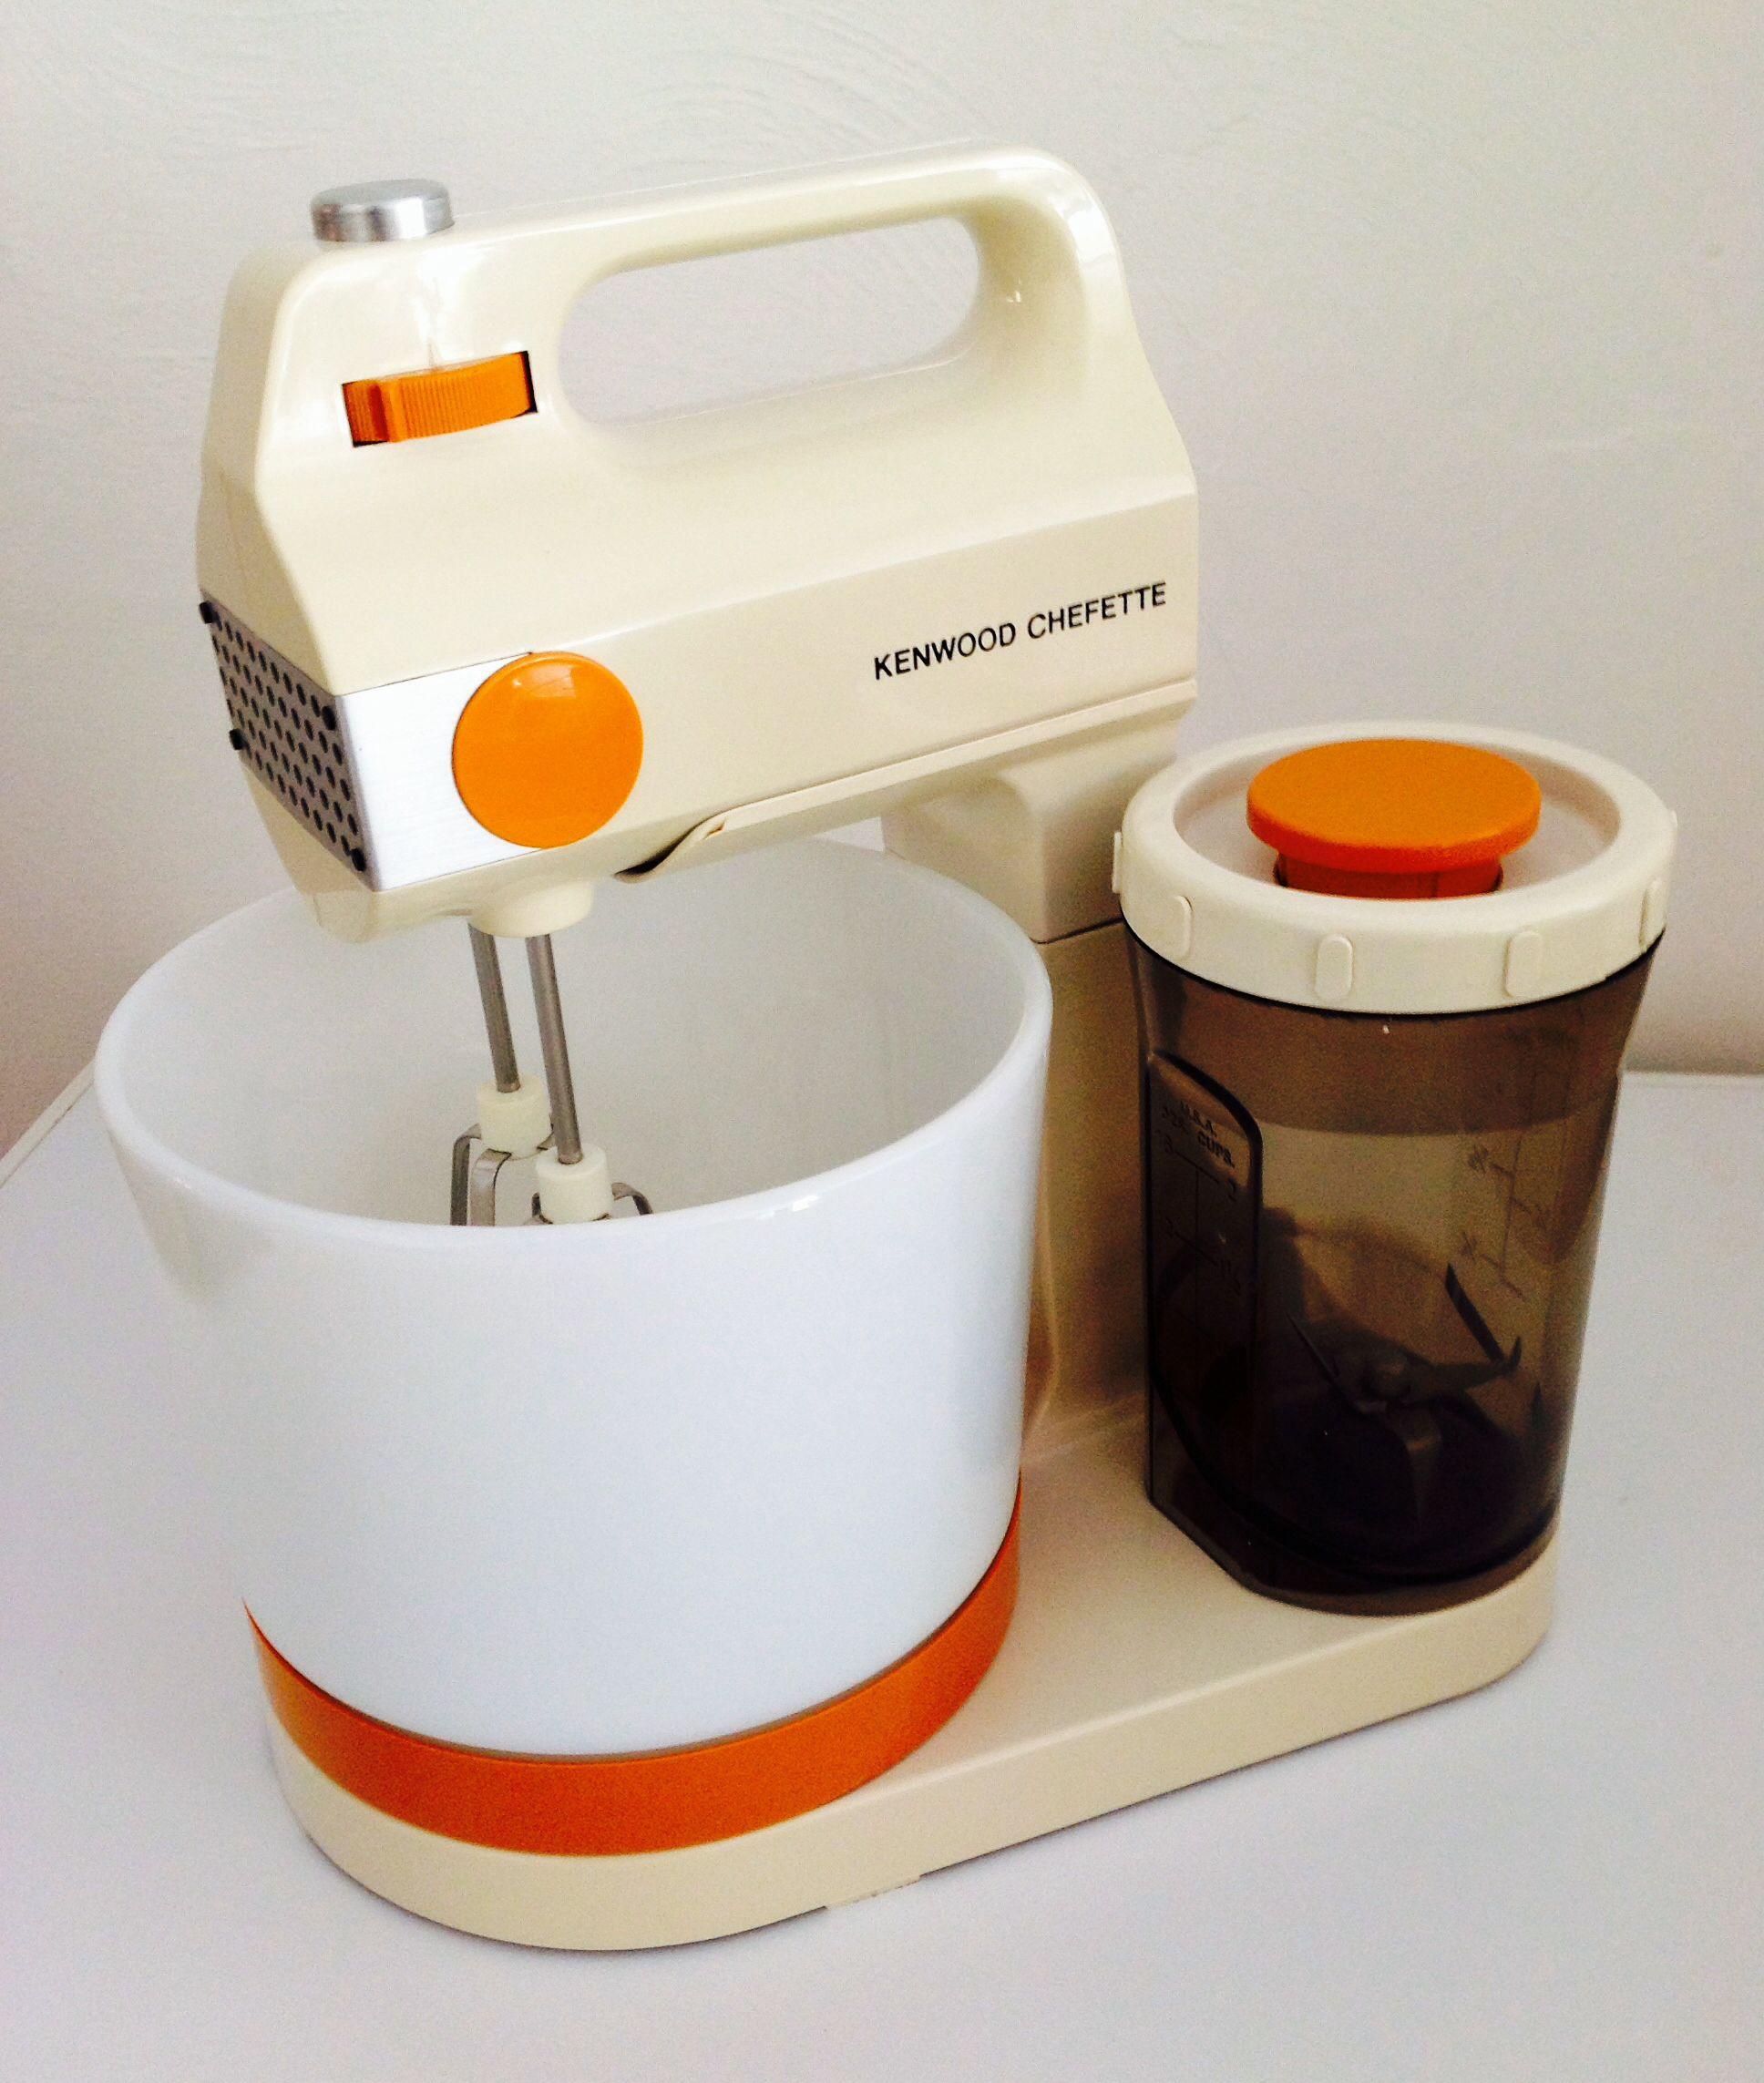 Kenwood Chefette stand/handheld mixer. Kenneth Grange design ...